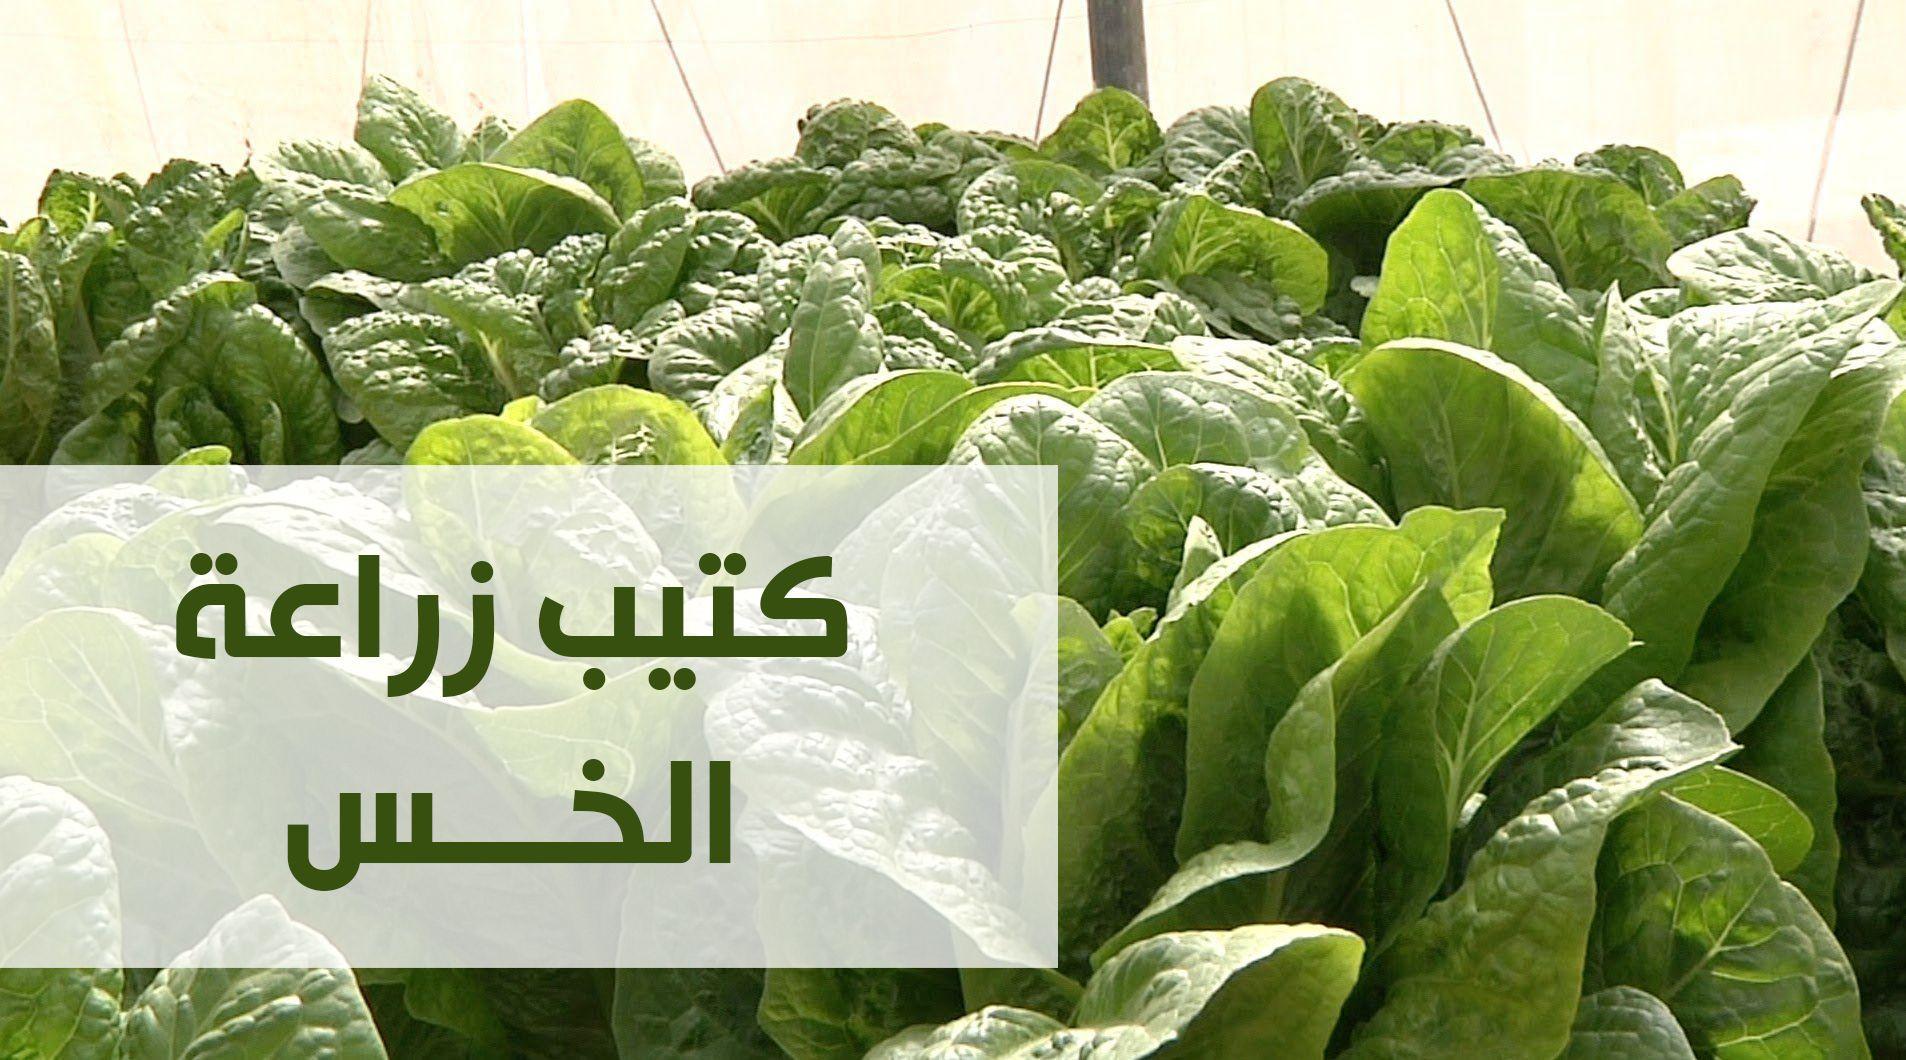 زراعة الخس Vegetables Lettuce Cabbage